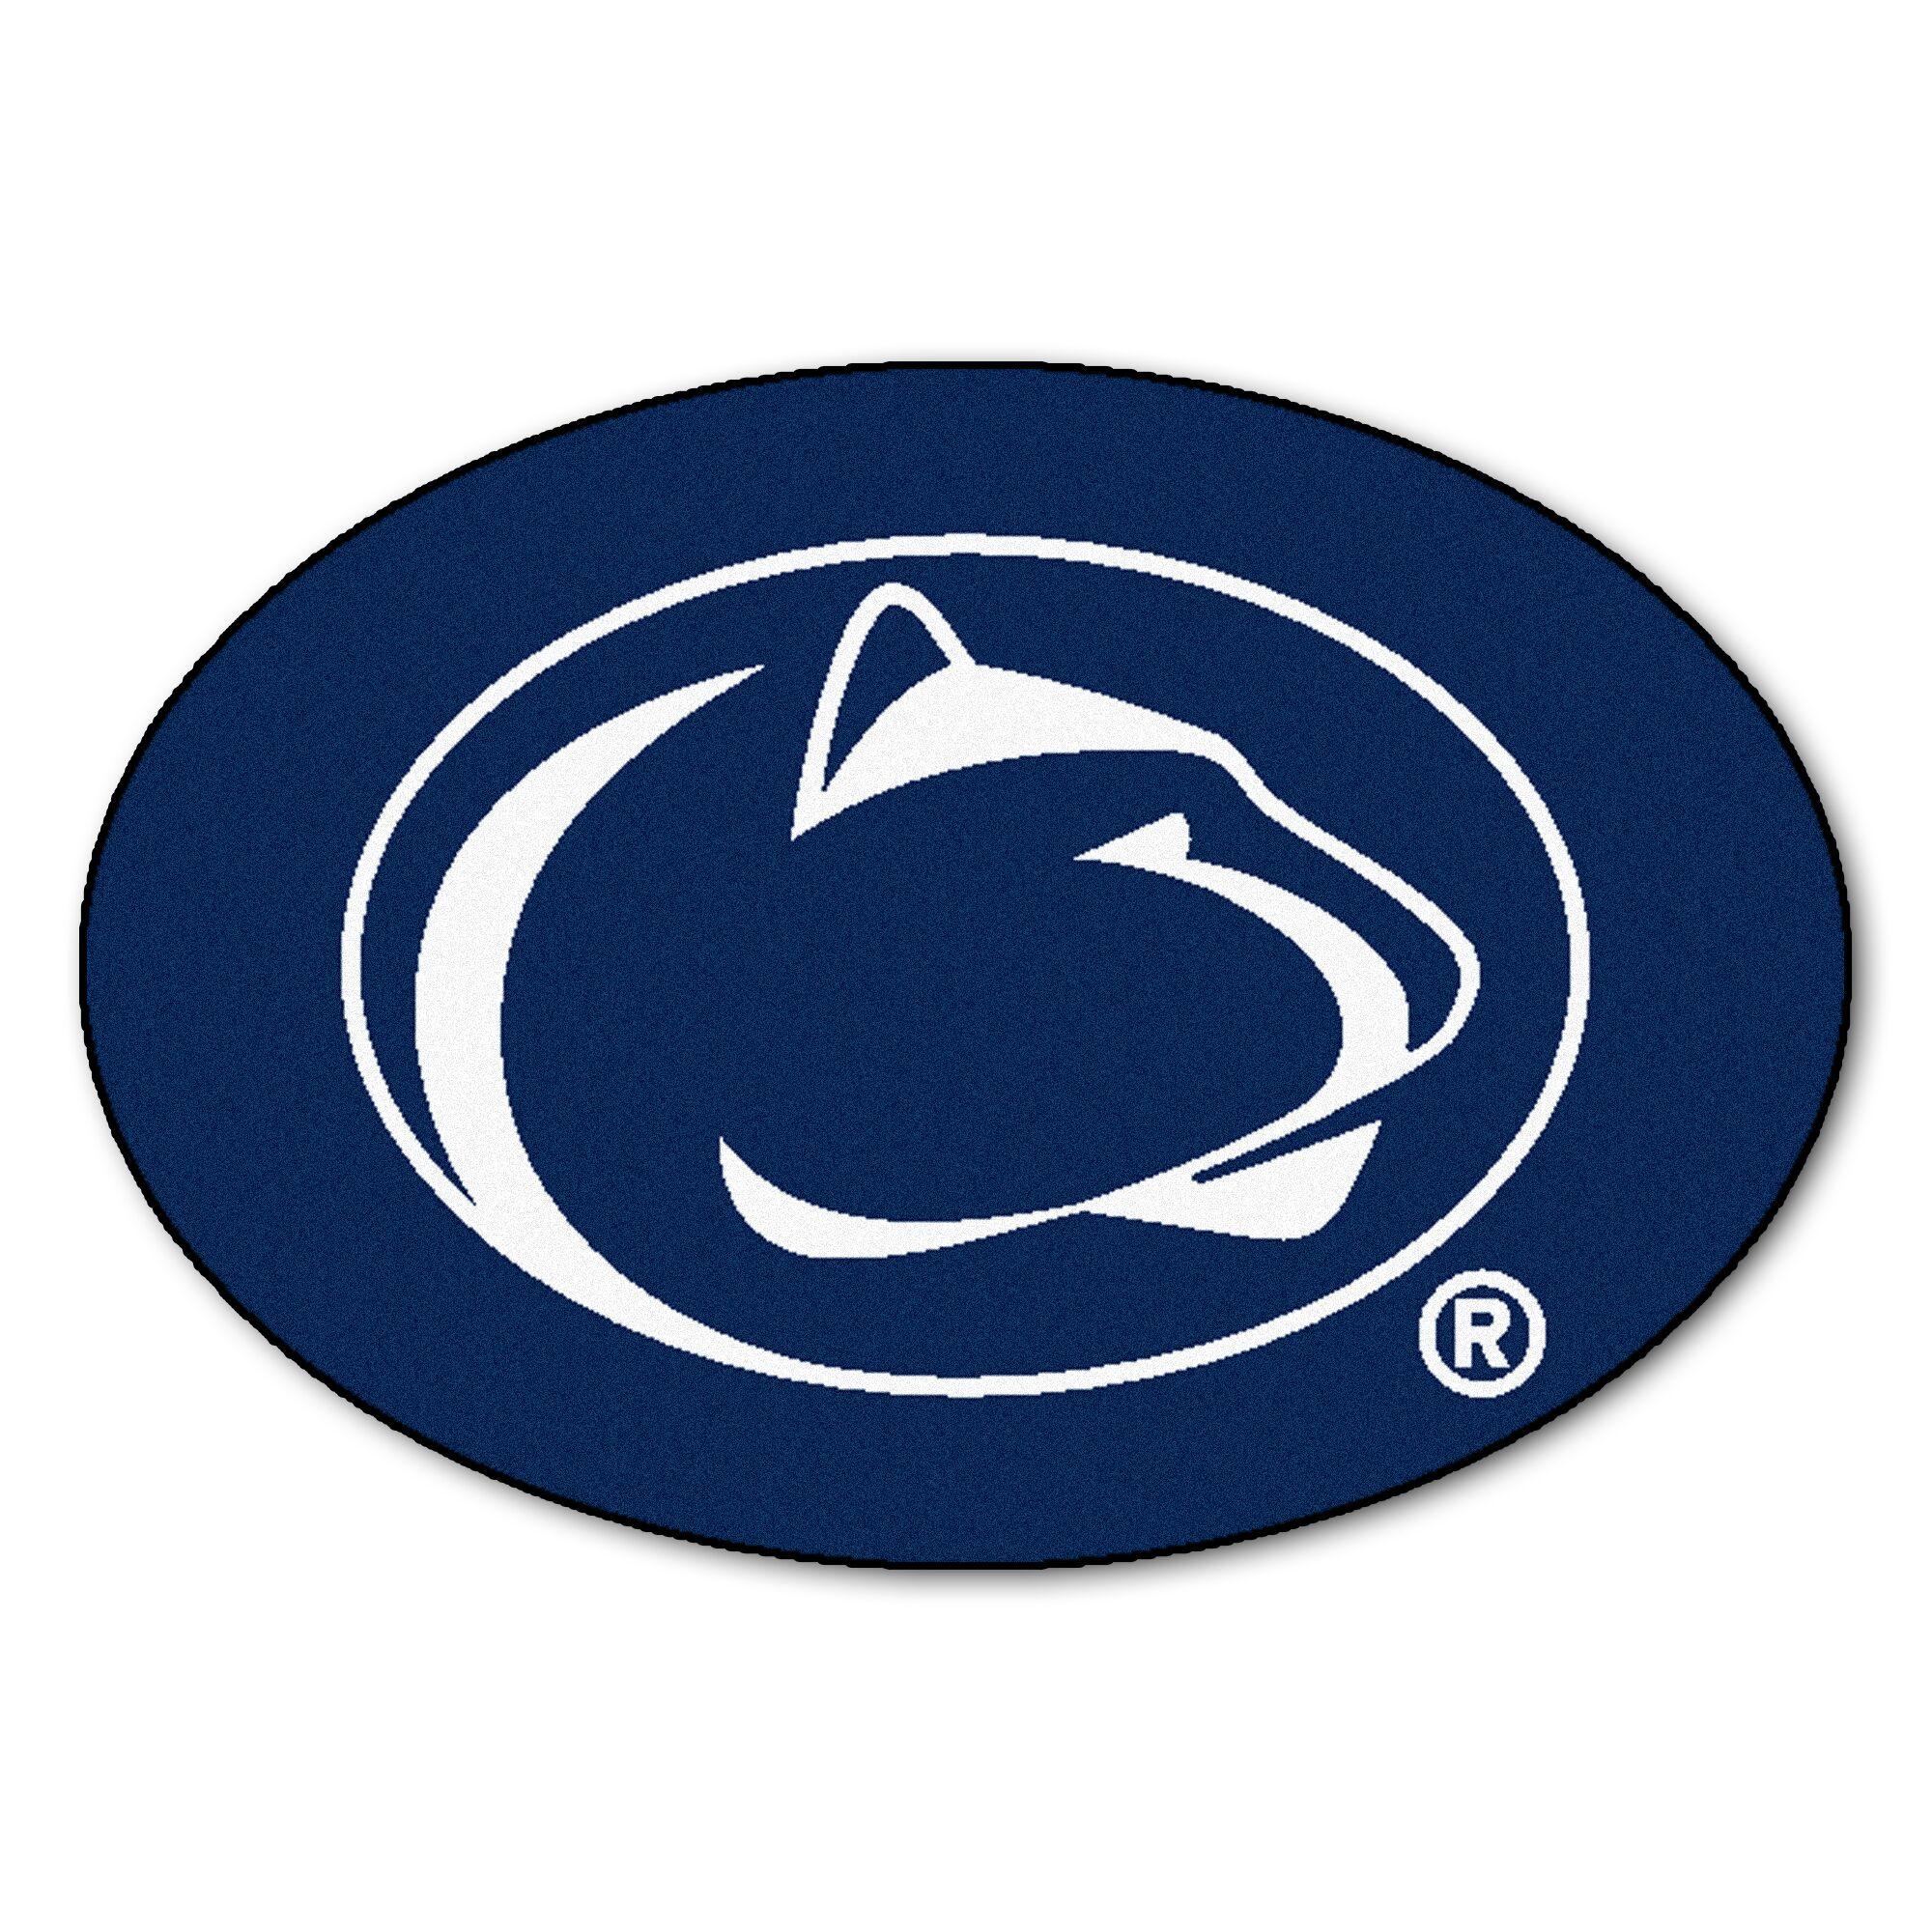 Collegiate Penn State Doormat Color: Blue, Mat Size: Oval 2'6